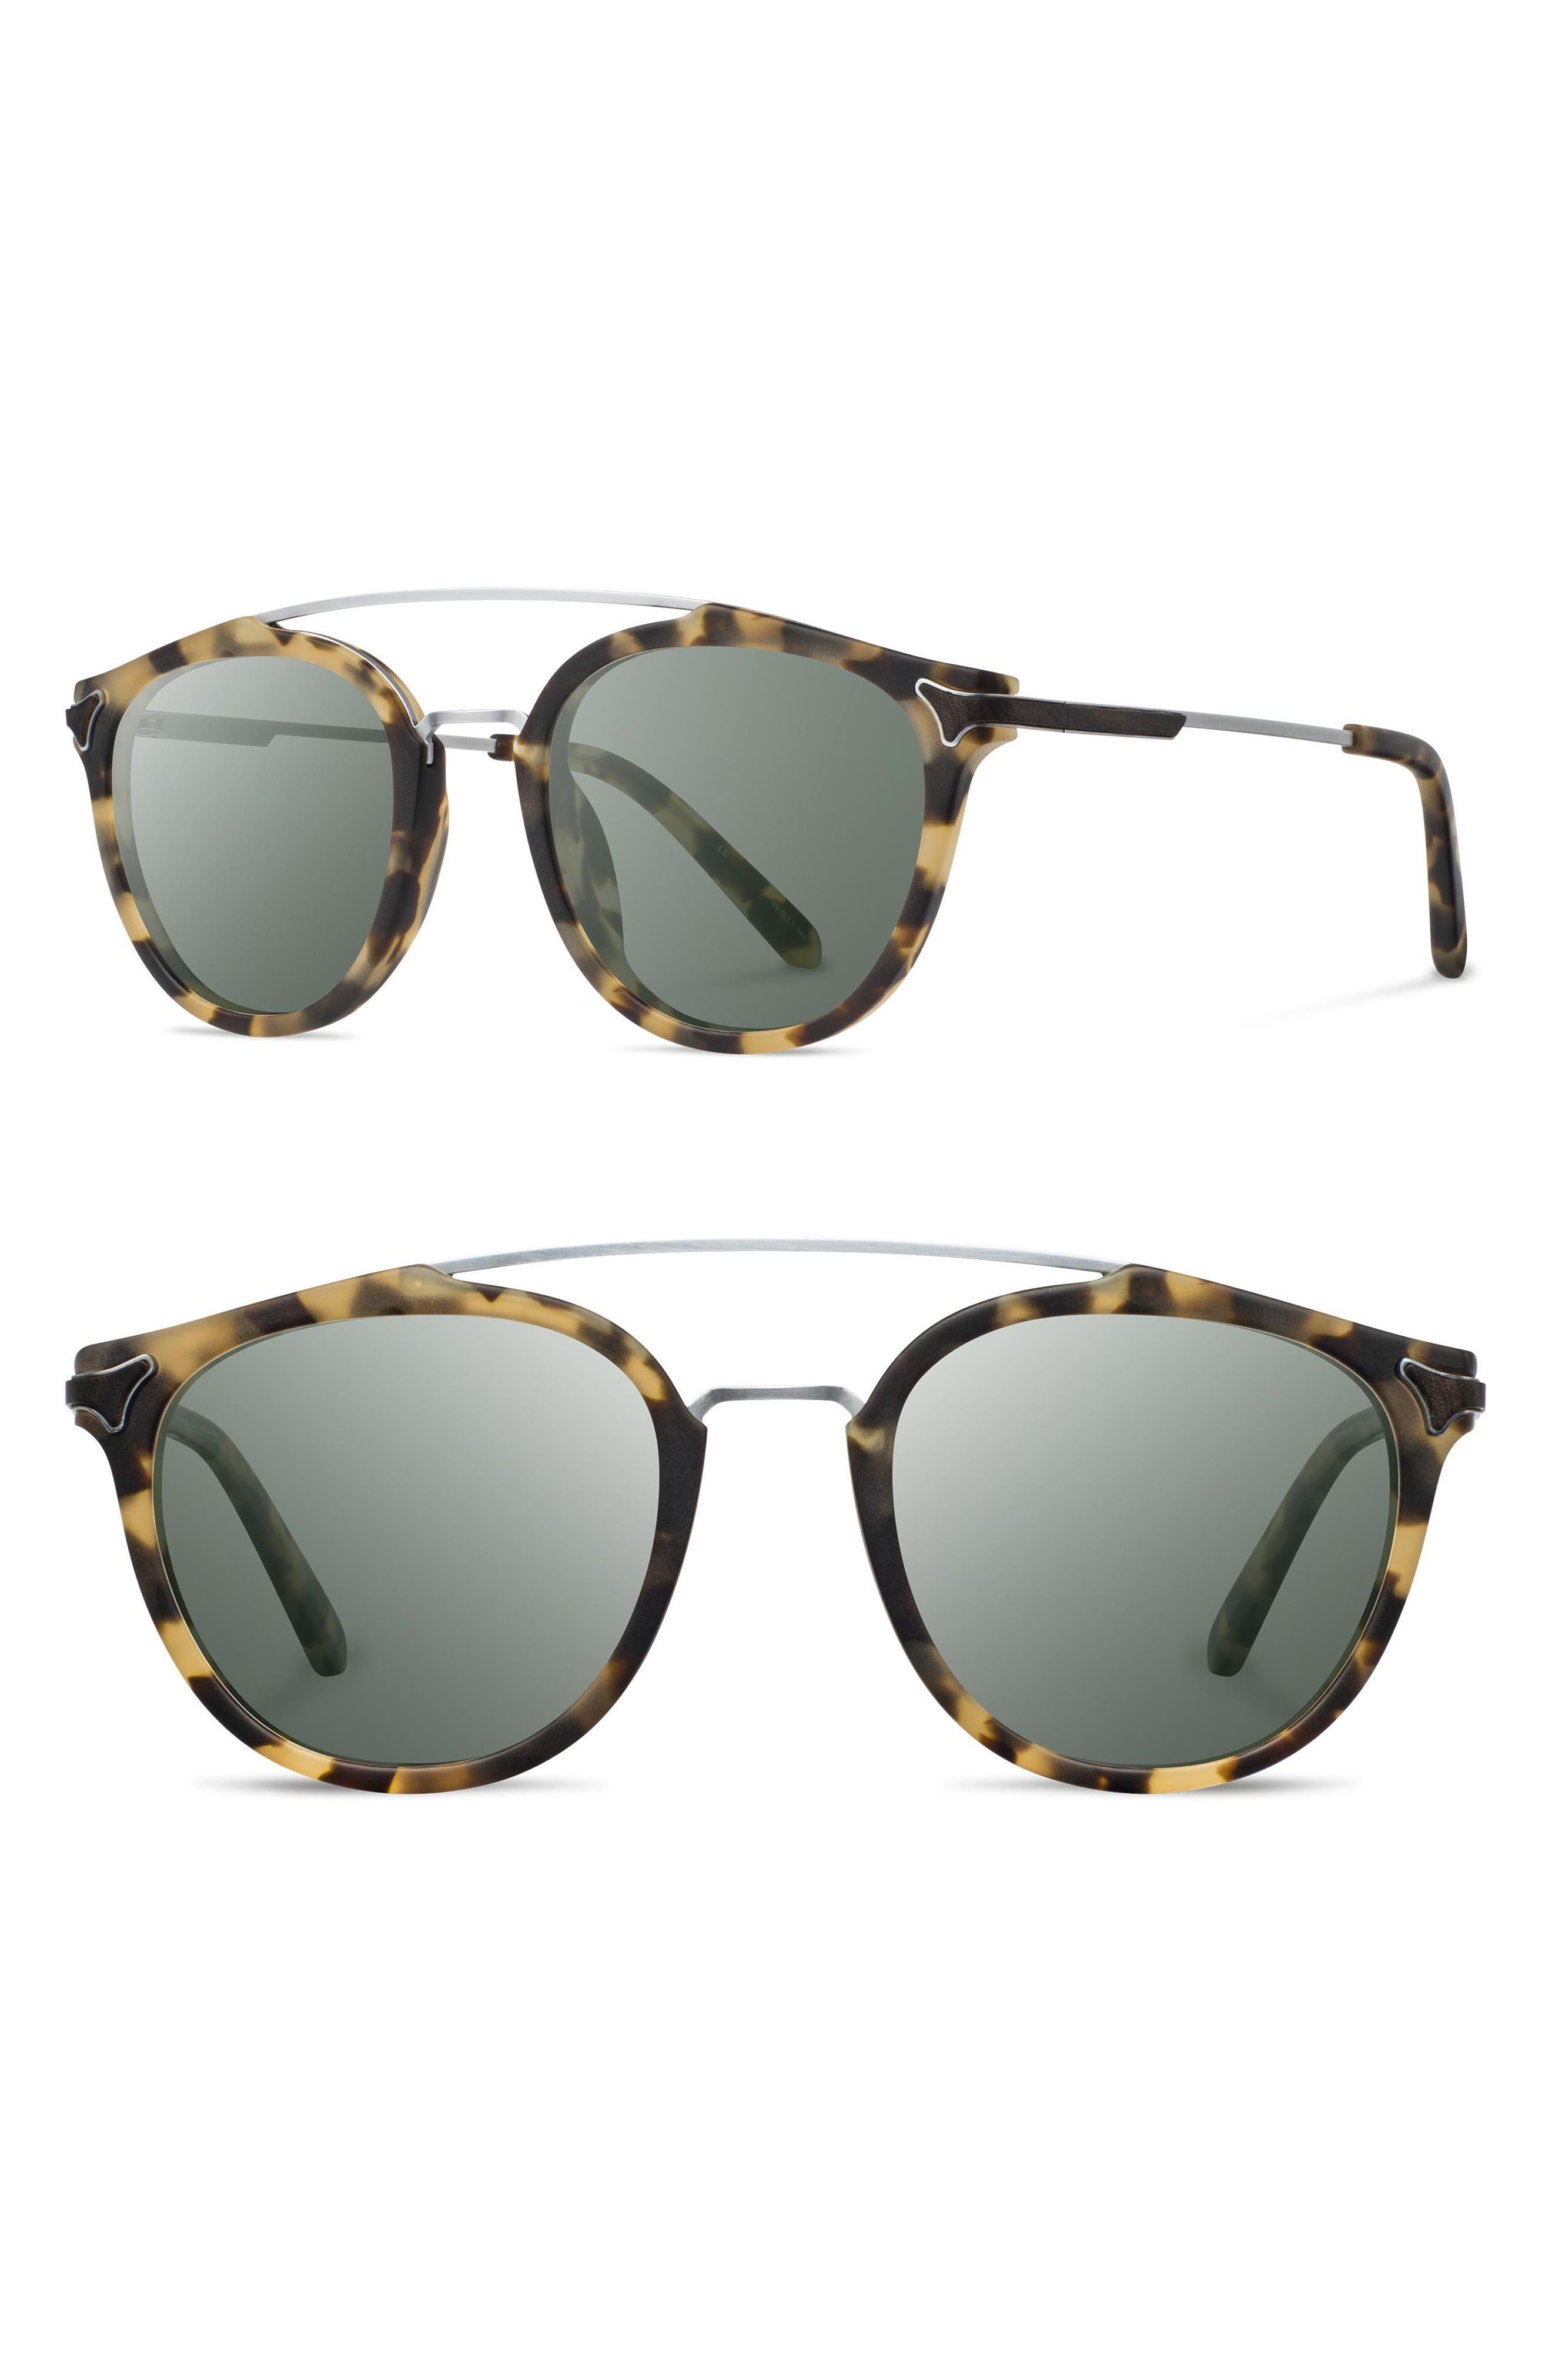 SHWOOD Kinsrow 49Mm Polarized Round Sunglasses - Matte Havana/ G15